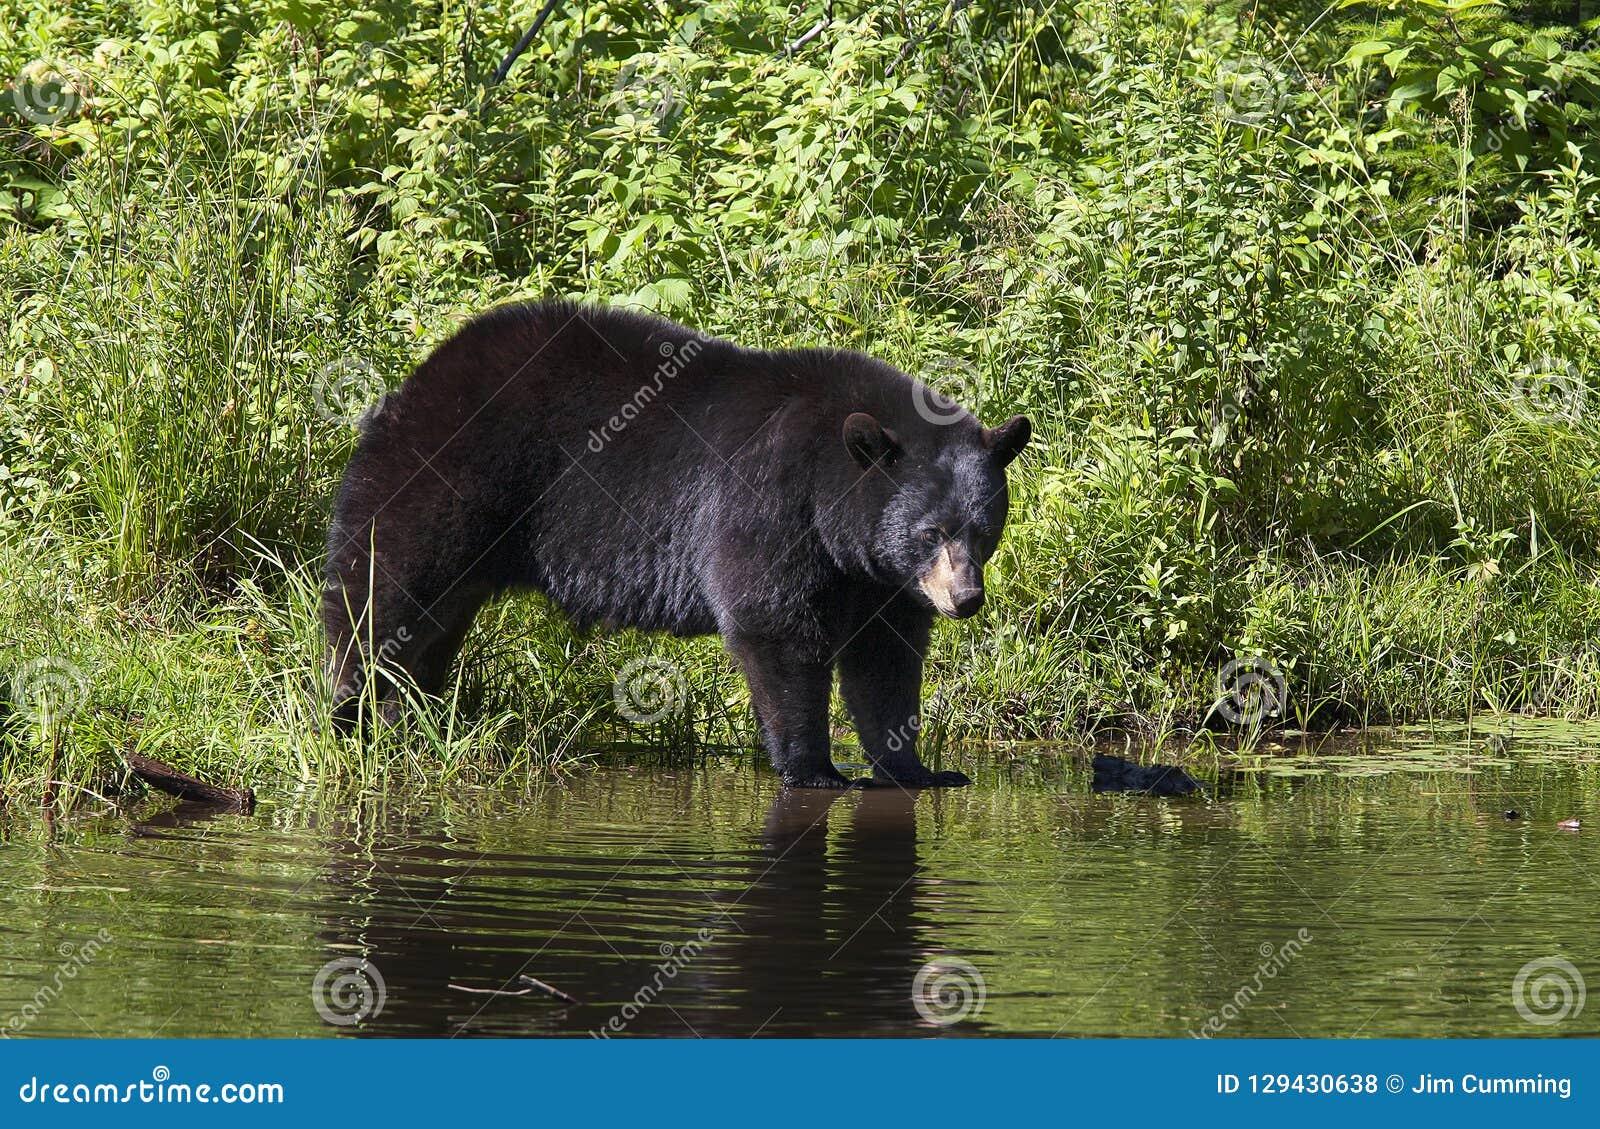 A Big Black bear Ursus americanus walking into the water in summer in Canada